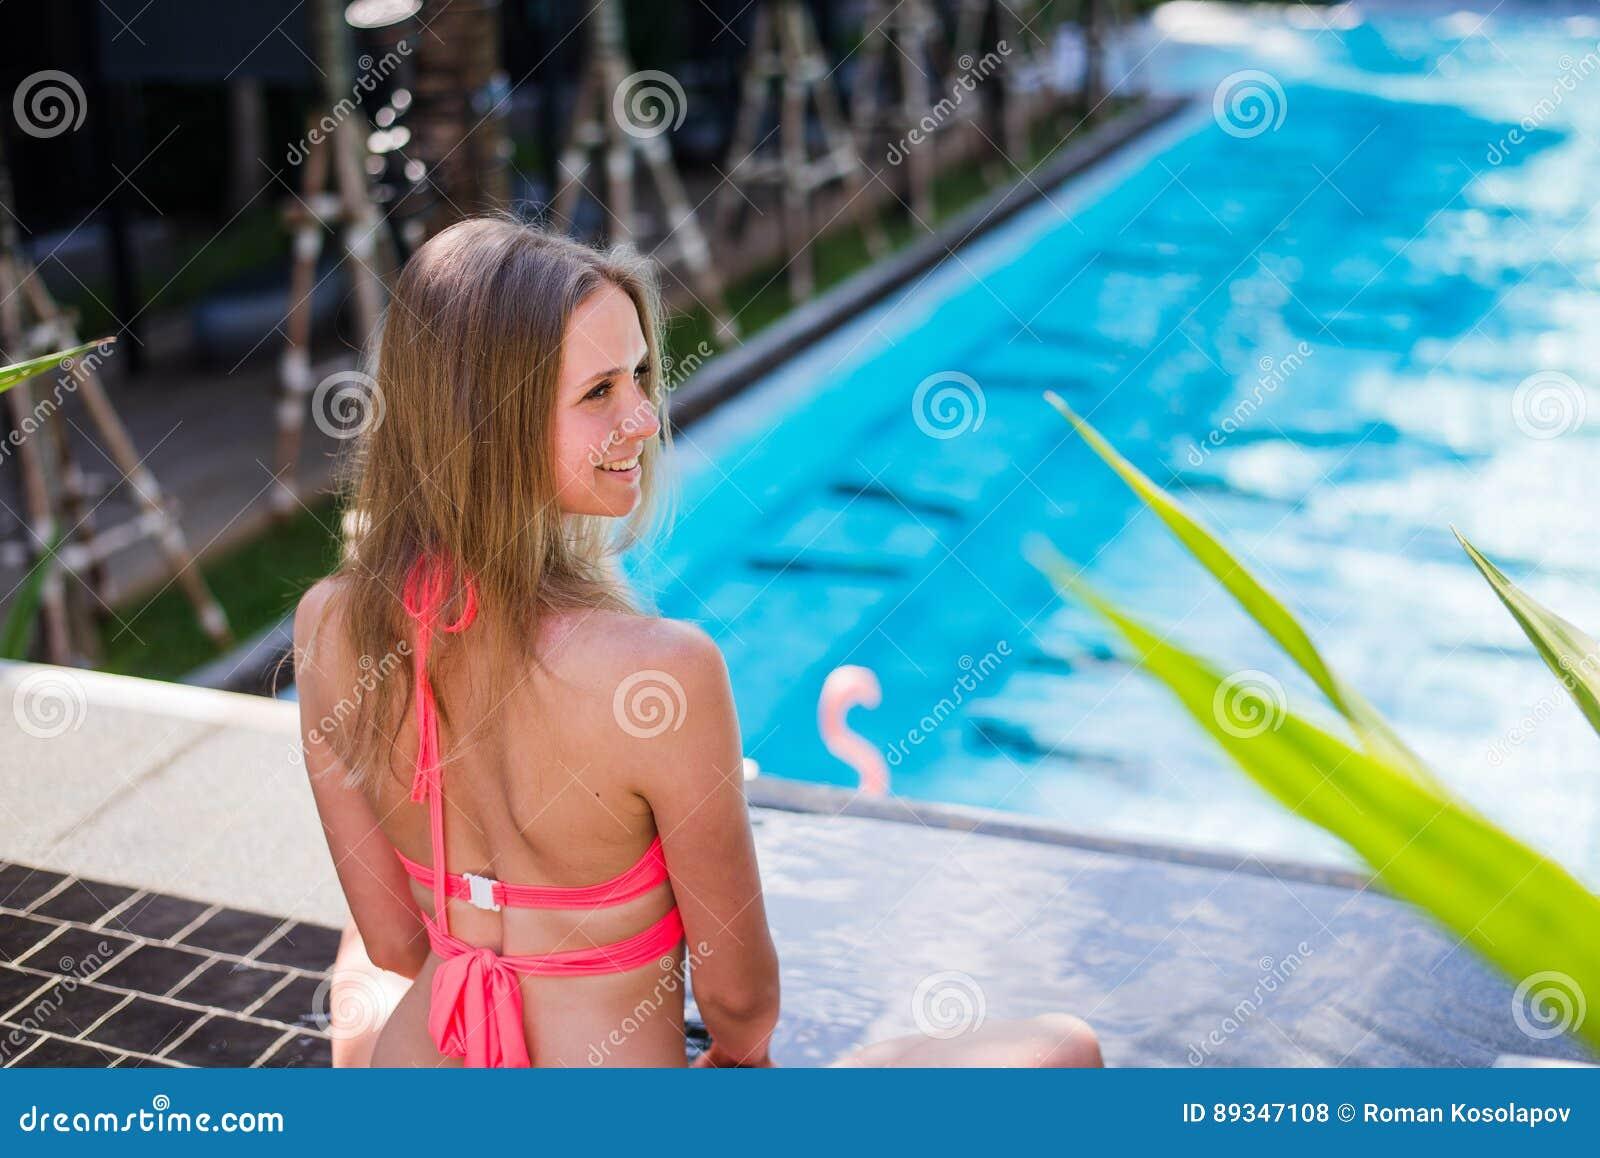 d5be5c2c73b Enjoying Suntan. Pretty Young Woman In Bikini Sitting Near Swimming ...